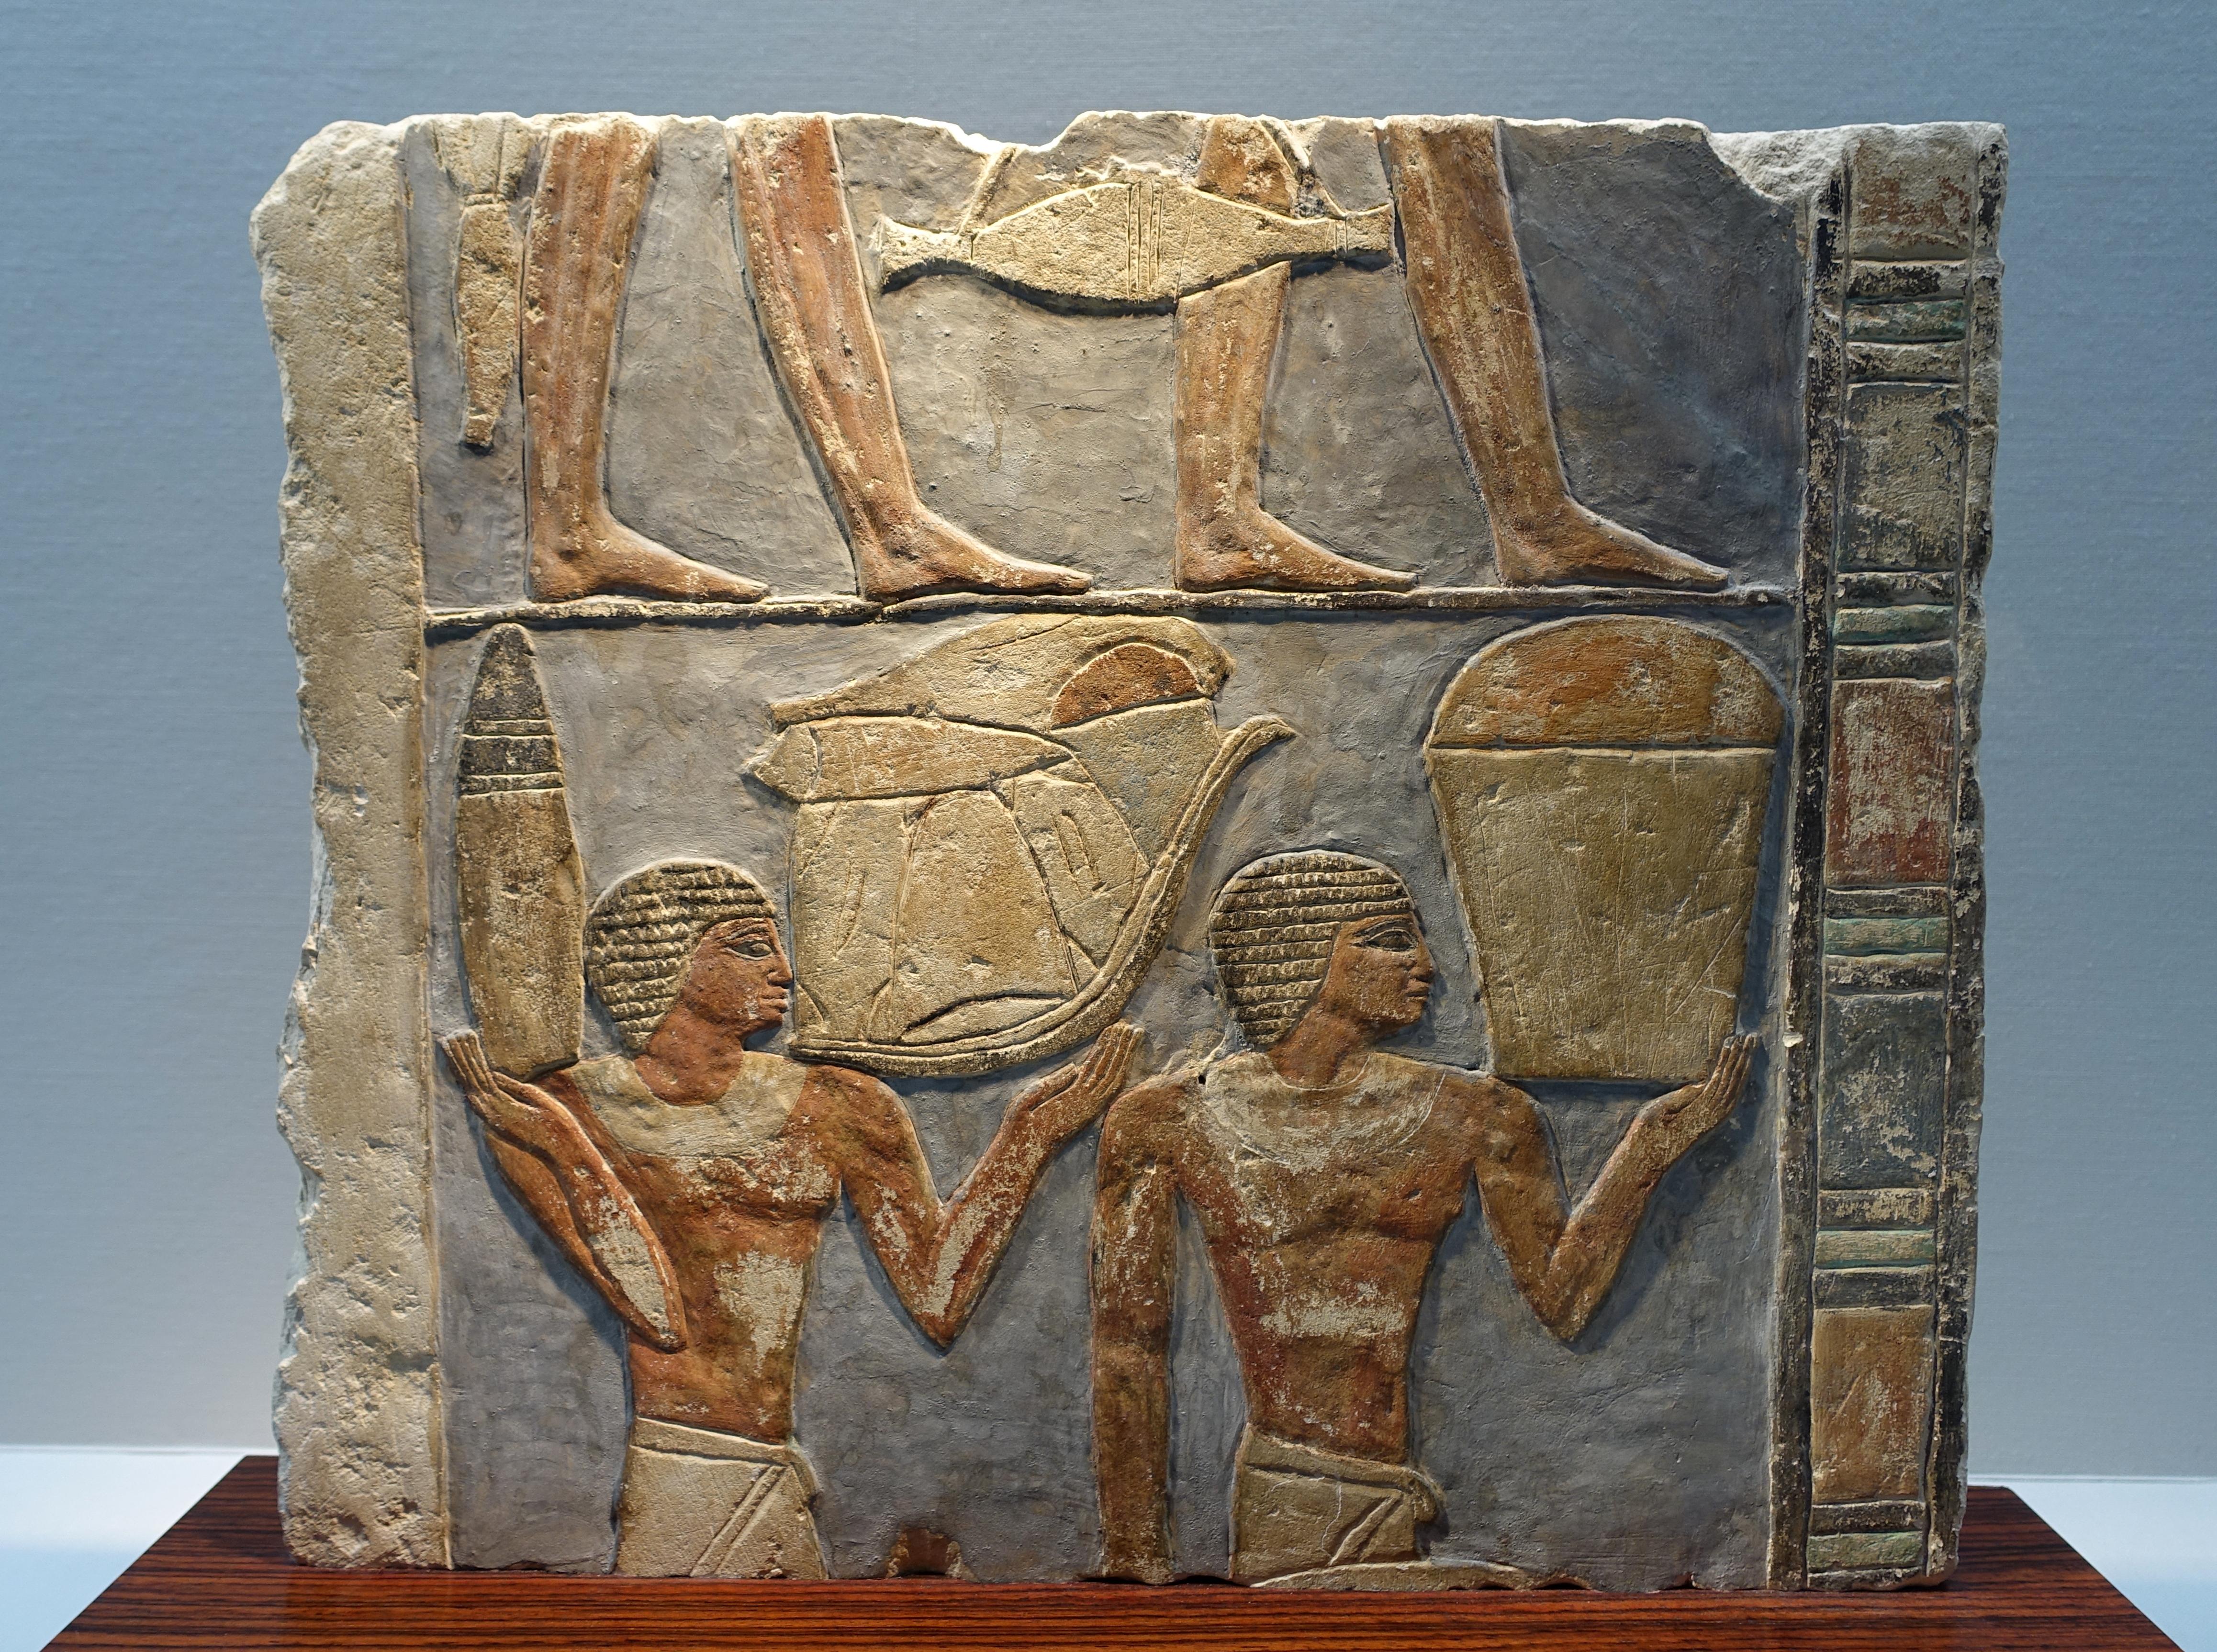 https://upload.wikimedia.org/wikipedia/commons/f/f7/Relief_of_servants_bearing_food%2C_Saqqarah%2C_Egypt%2C_Old_Kingdom%2C_5th-6th_Dynasty%2C_c._2491-2181_BC%2C_limestone_-_Matsuoka_Museum_of_Art_-_Tokyo%2C_Japan_-_DSC06996.JPG